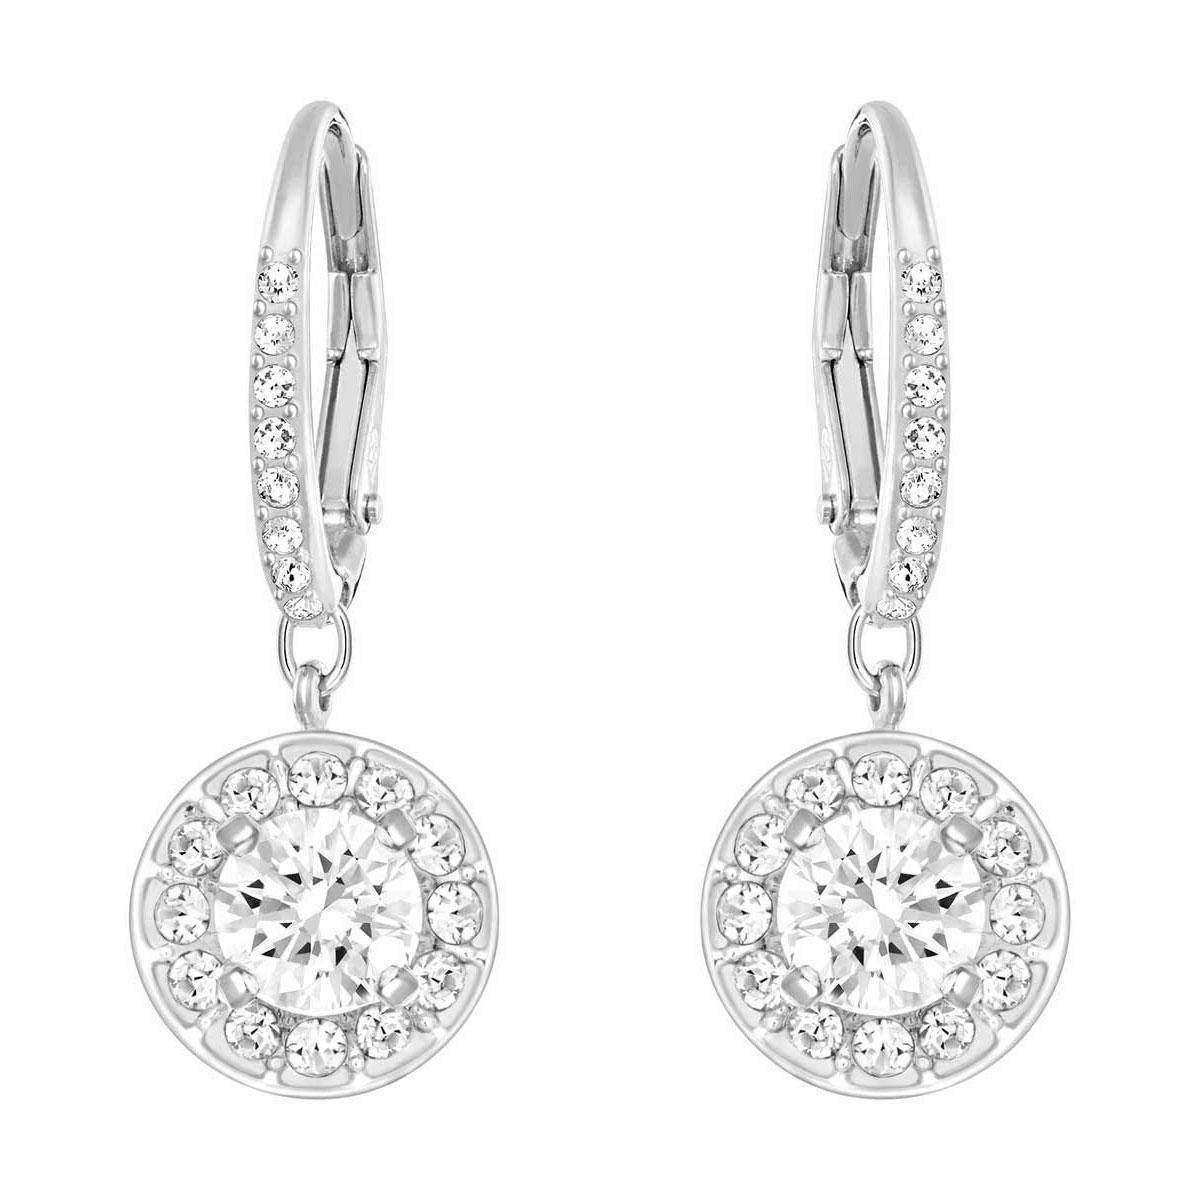 Swarovski Attract Earrings, White, Rhodium